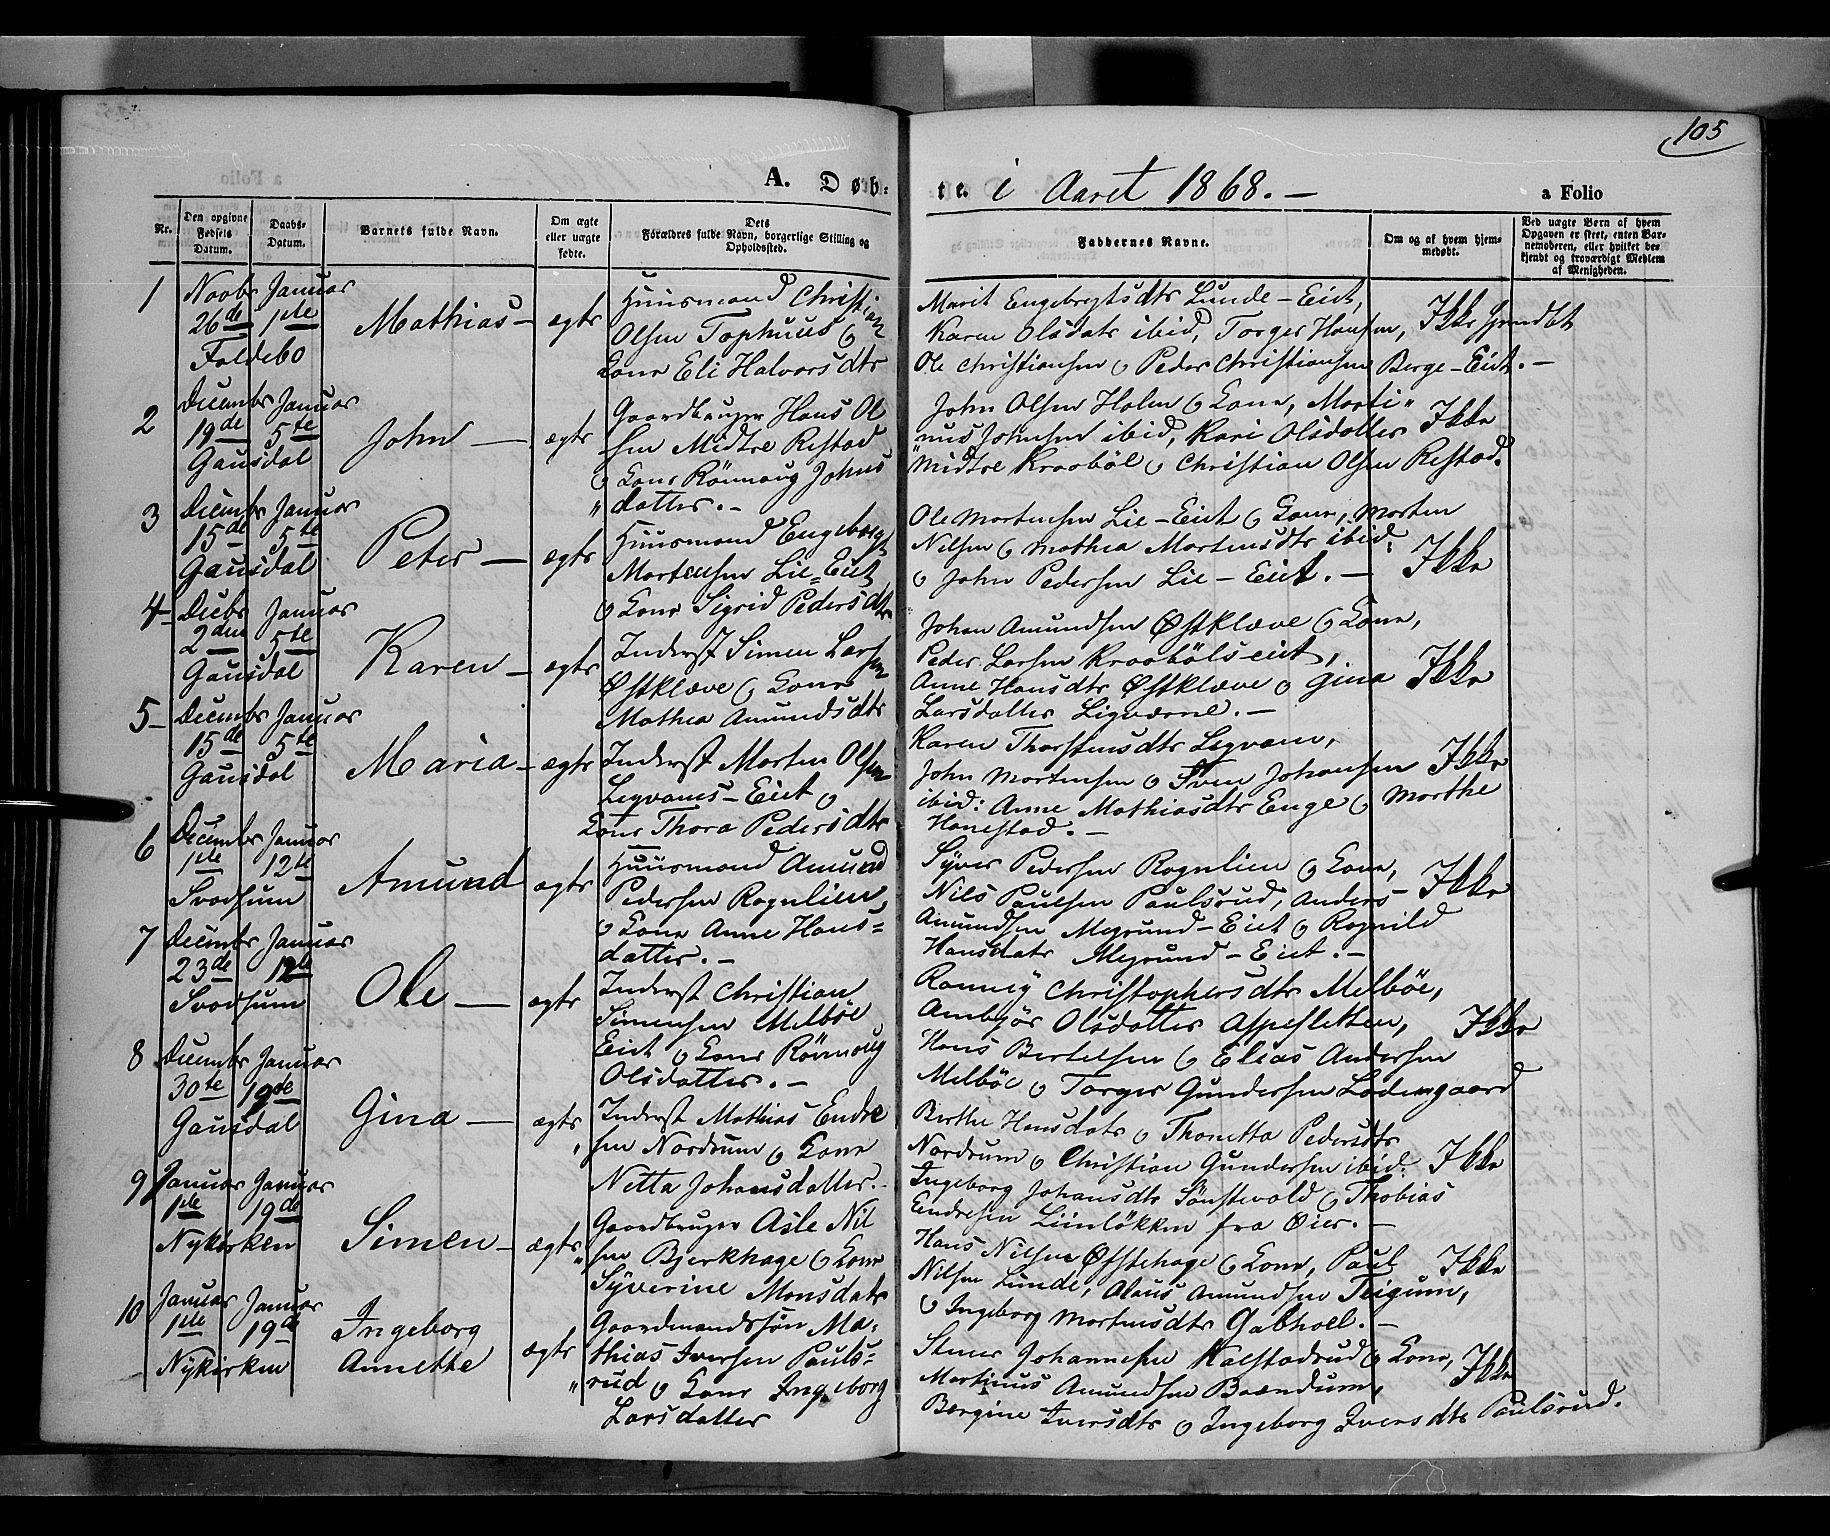 SAH, Gausdal prestekontor, Ministerialbok nr. 9, 1862-1873, s. 105